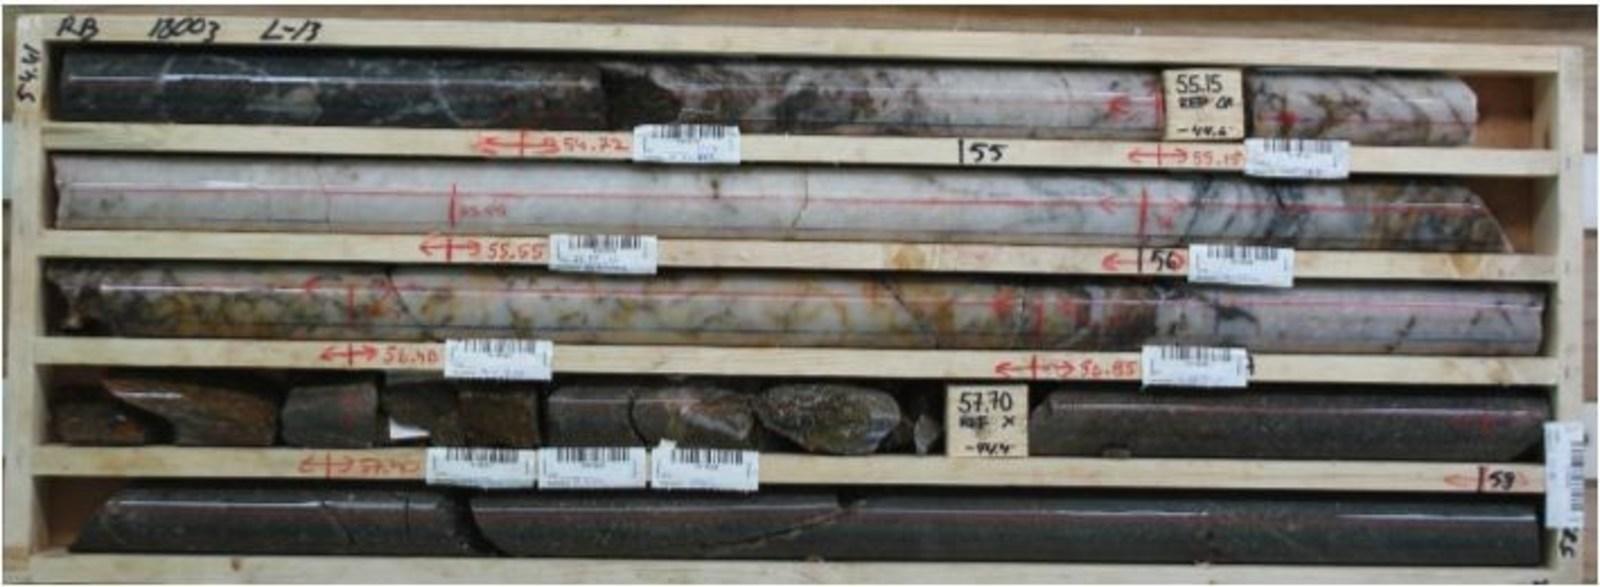 Aamurusko West; Quartz vein in drillhole RB18003; assays pending